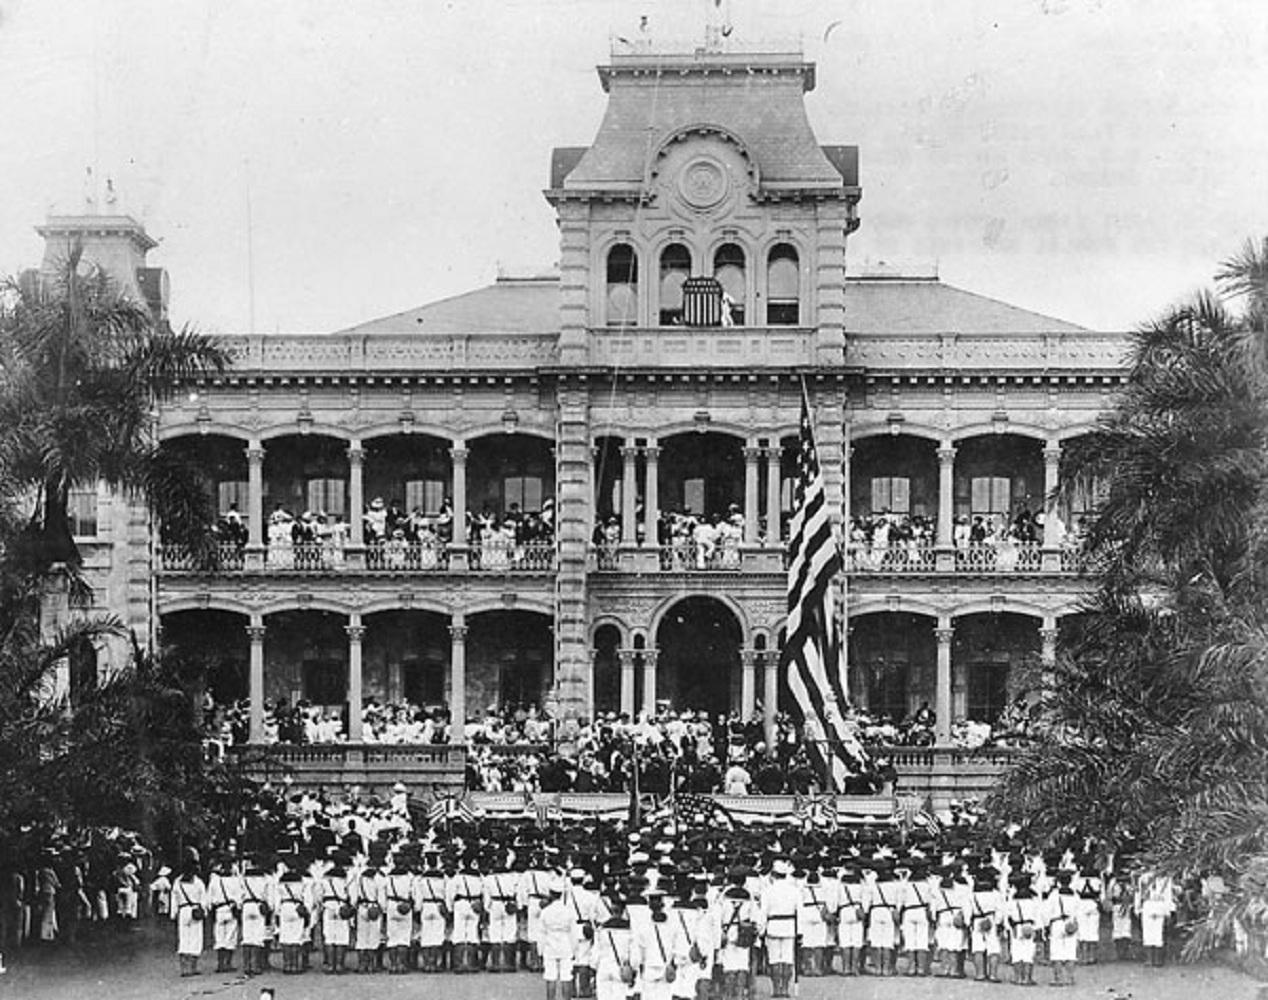 Raising American Flag at ʻIolani Palace, Honolulu, Hawaii, August 12, 1898